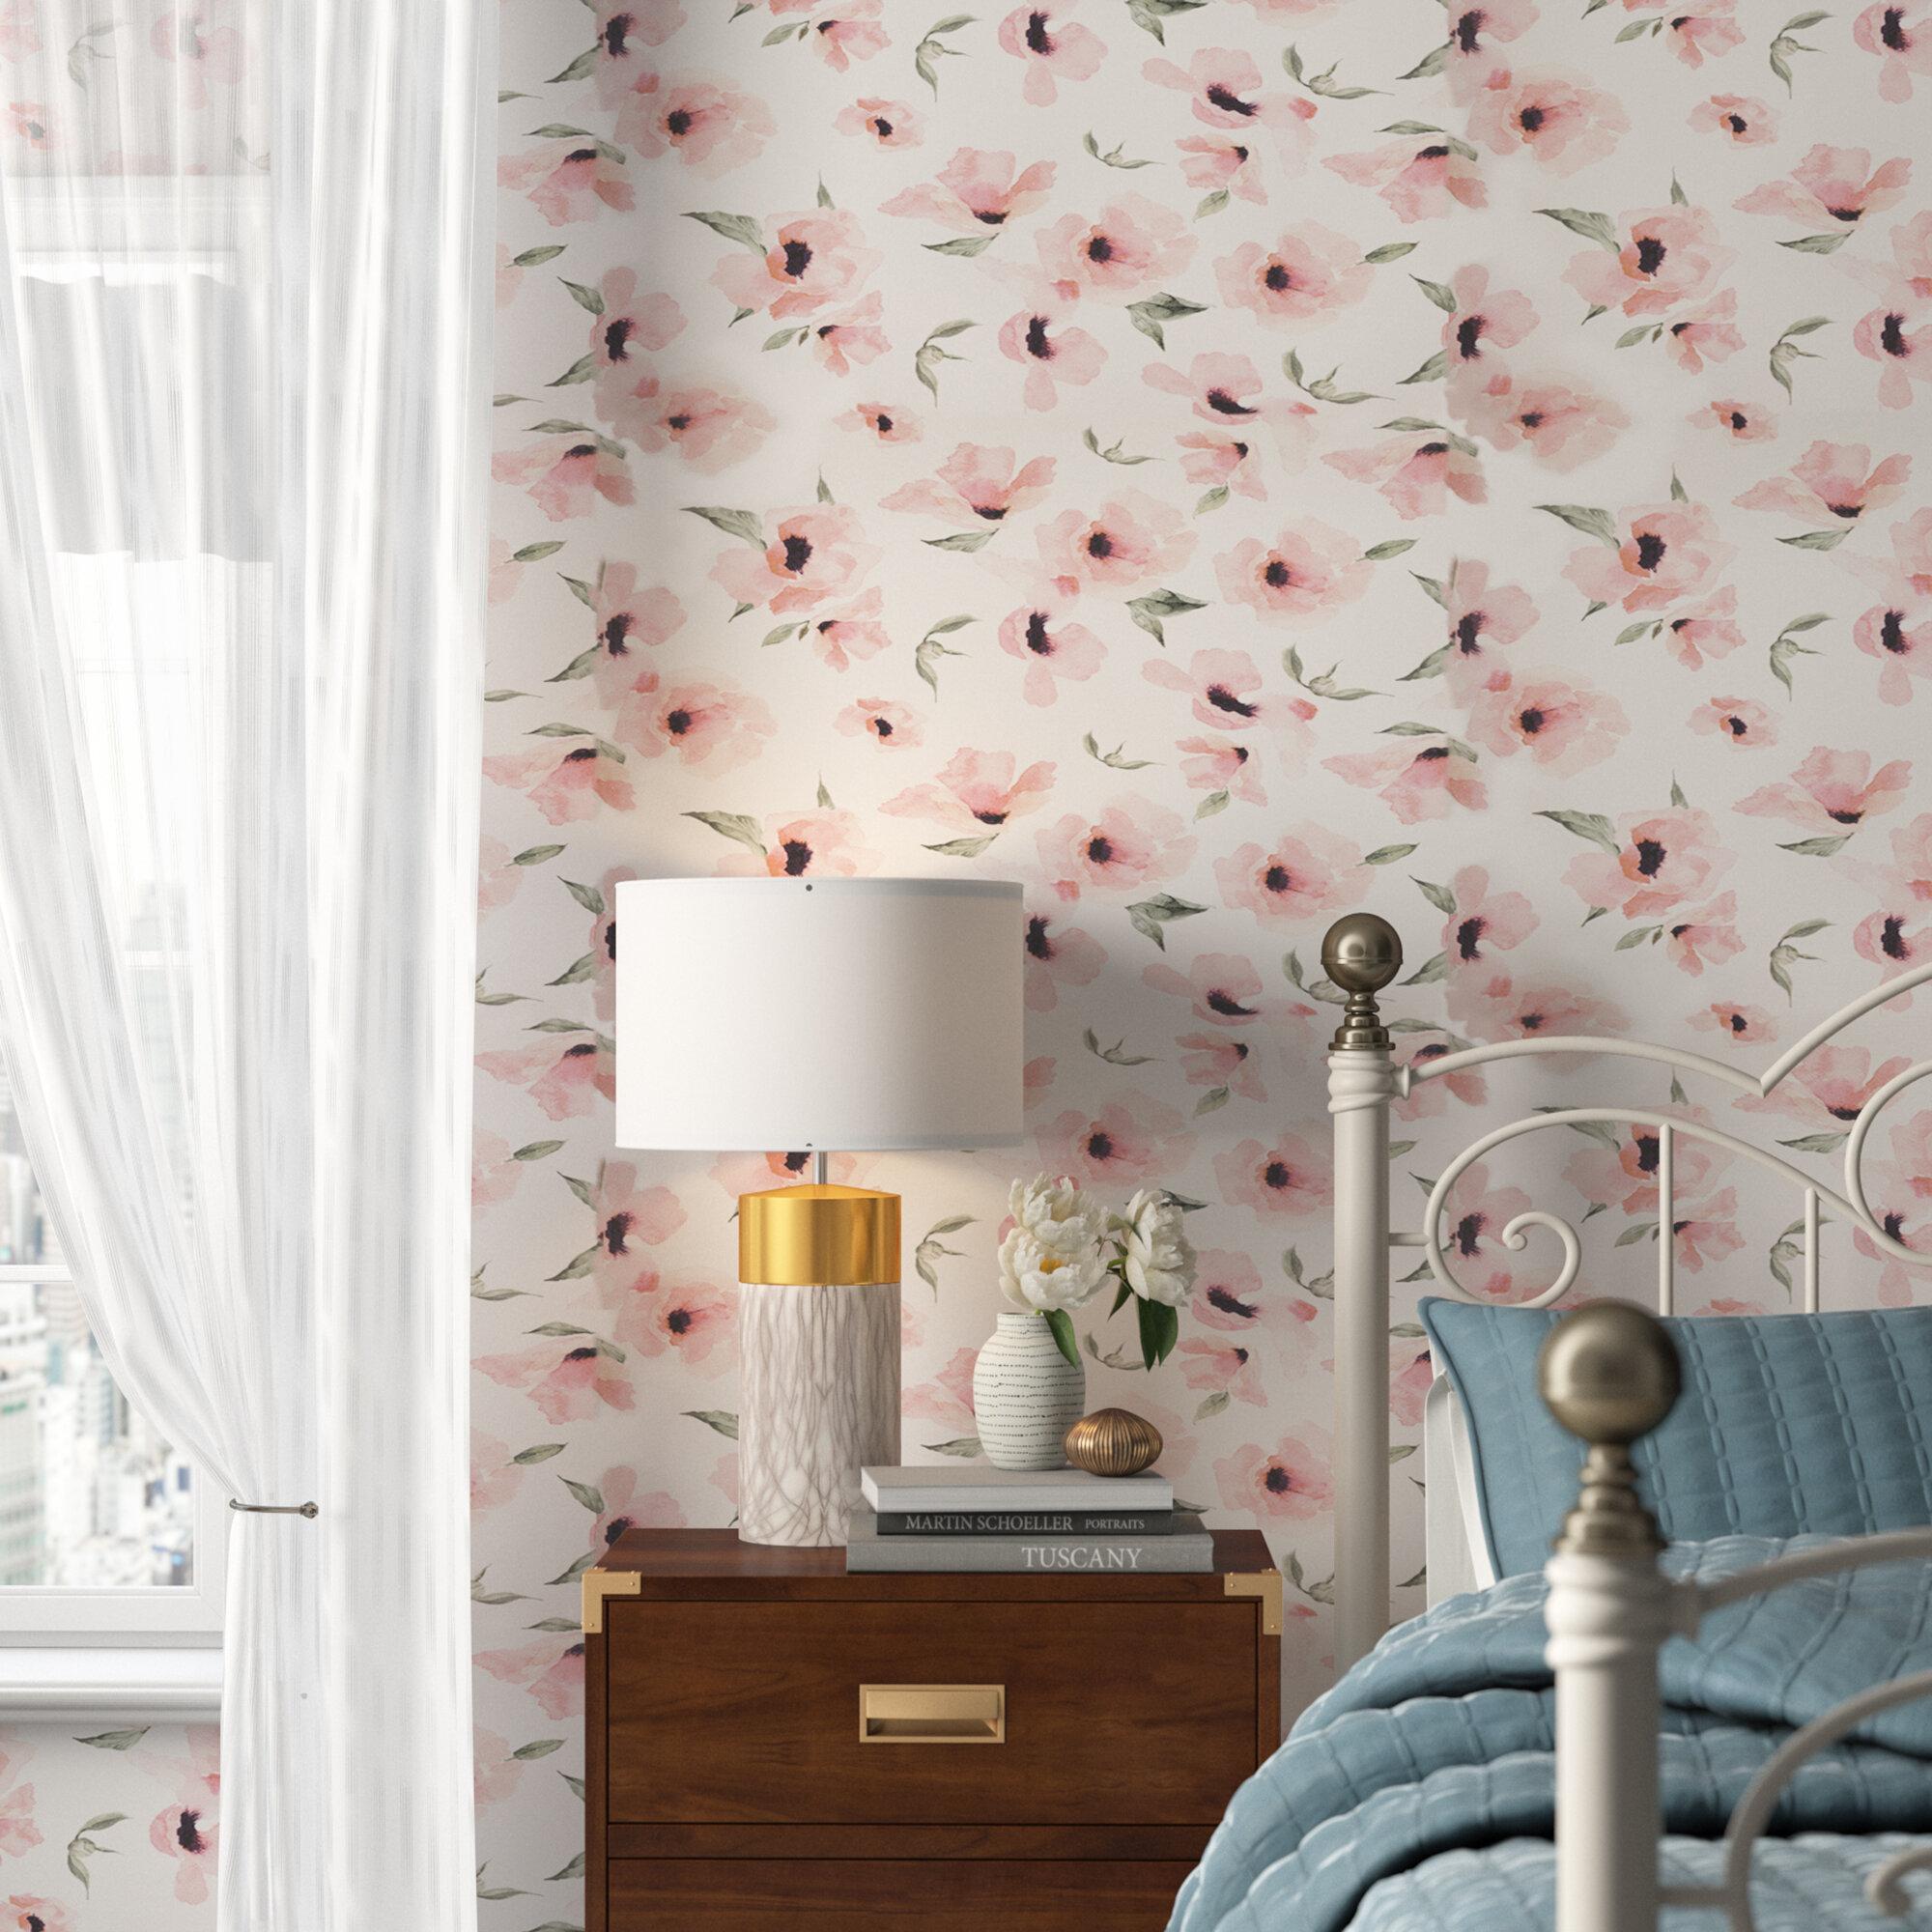 House Of Hampton Jiles Watercolor Poppy Flowers Matte Peel And Stick Wallpaper Panel Reviews Wayfair